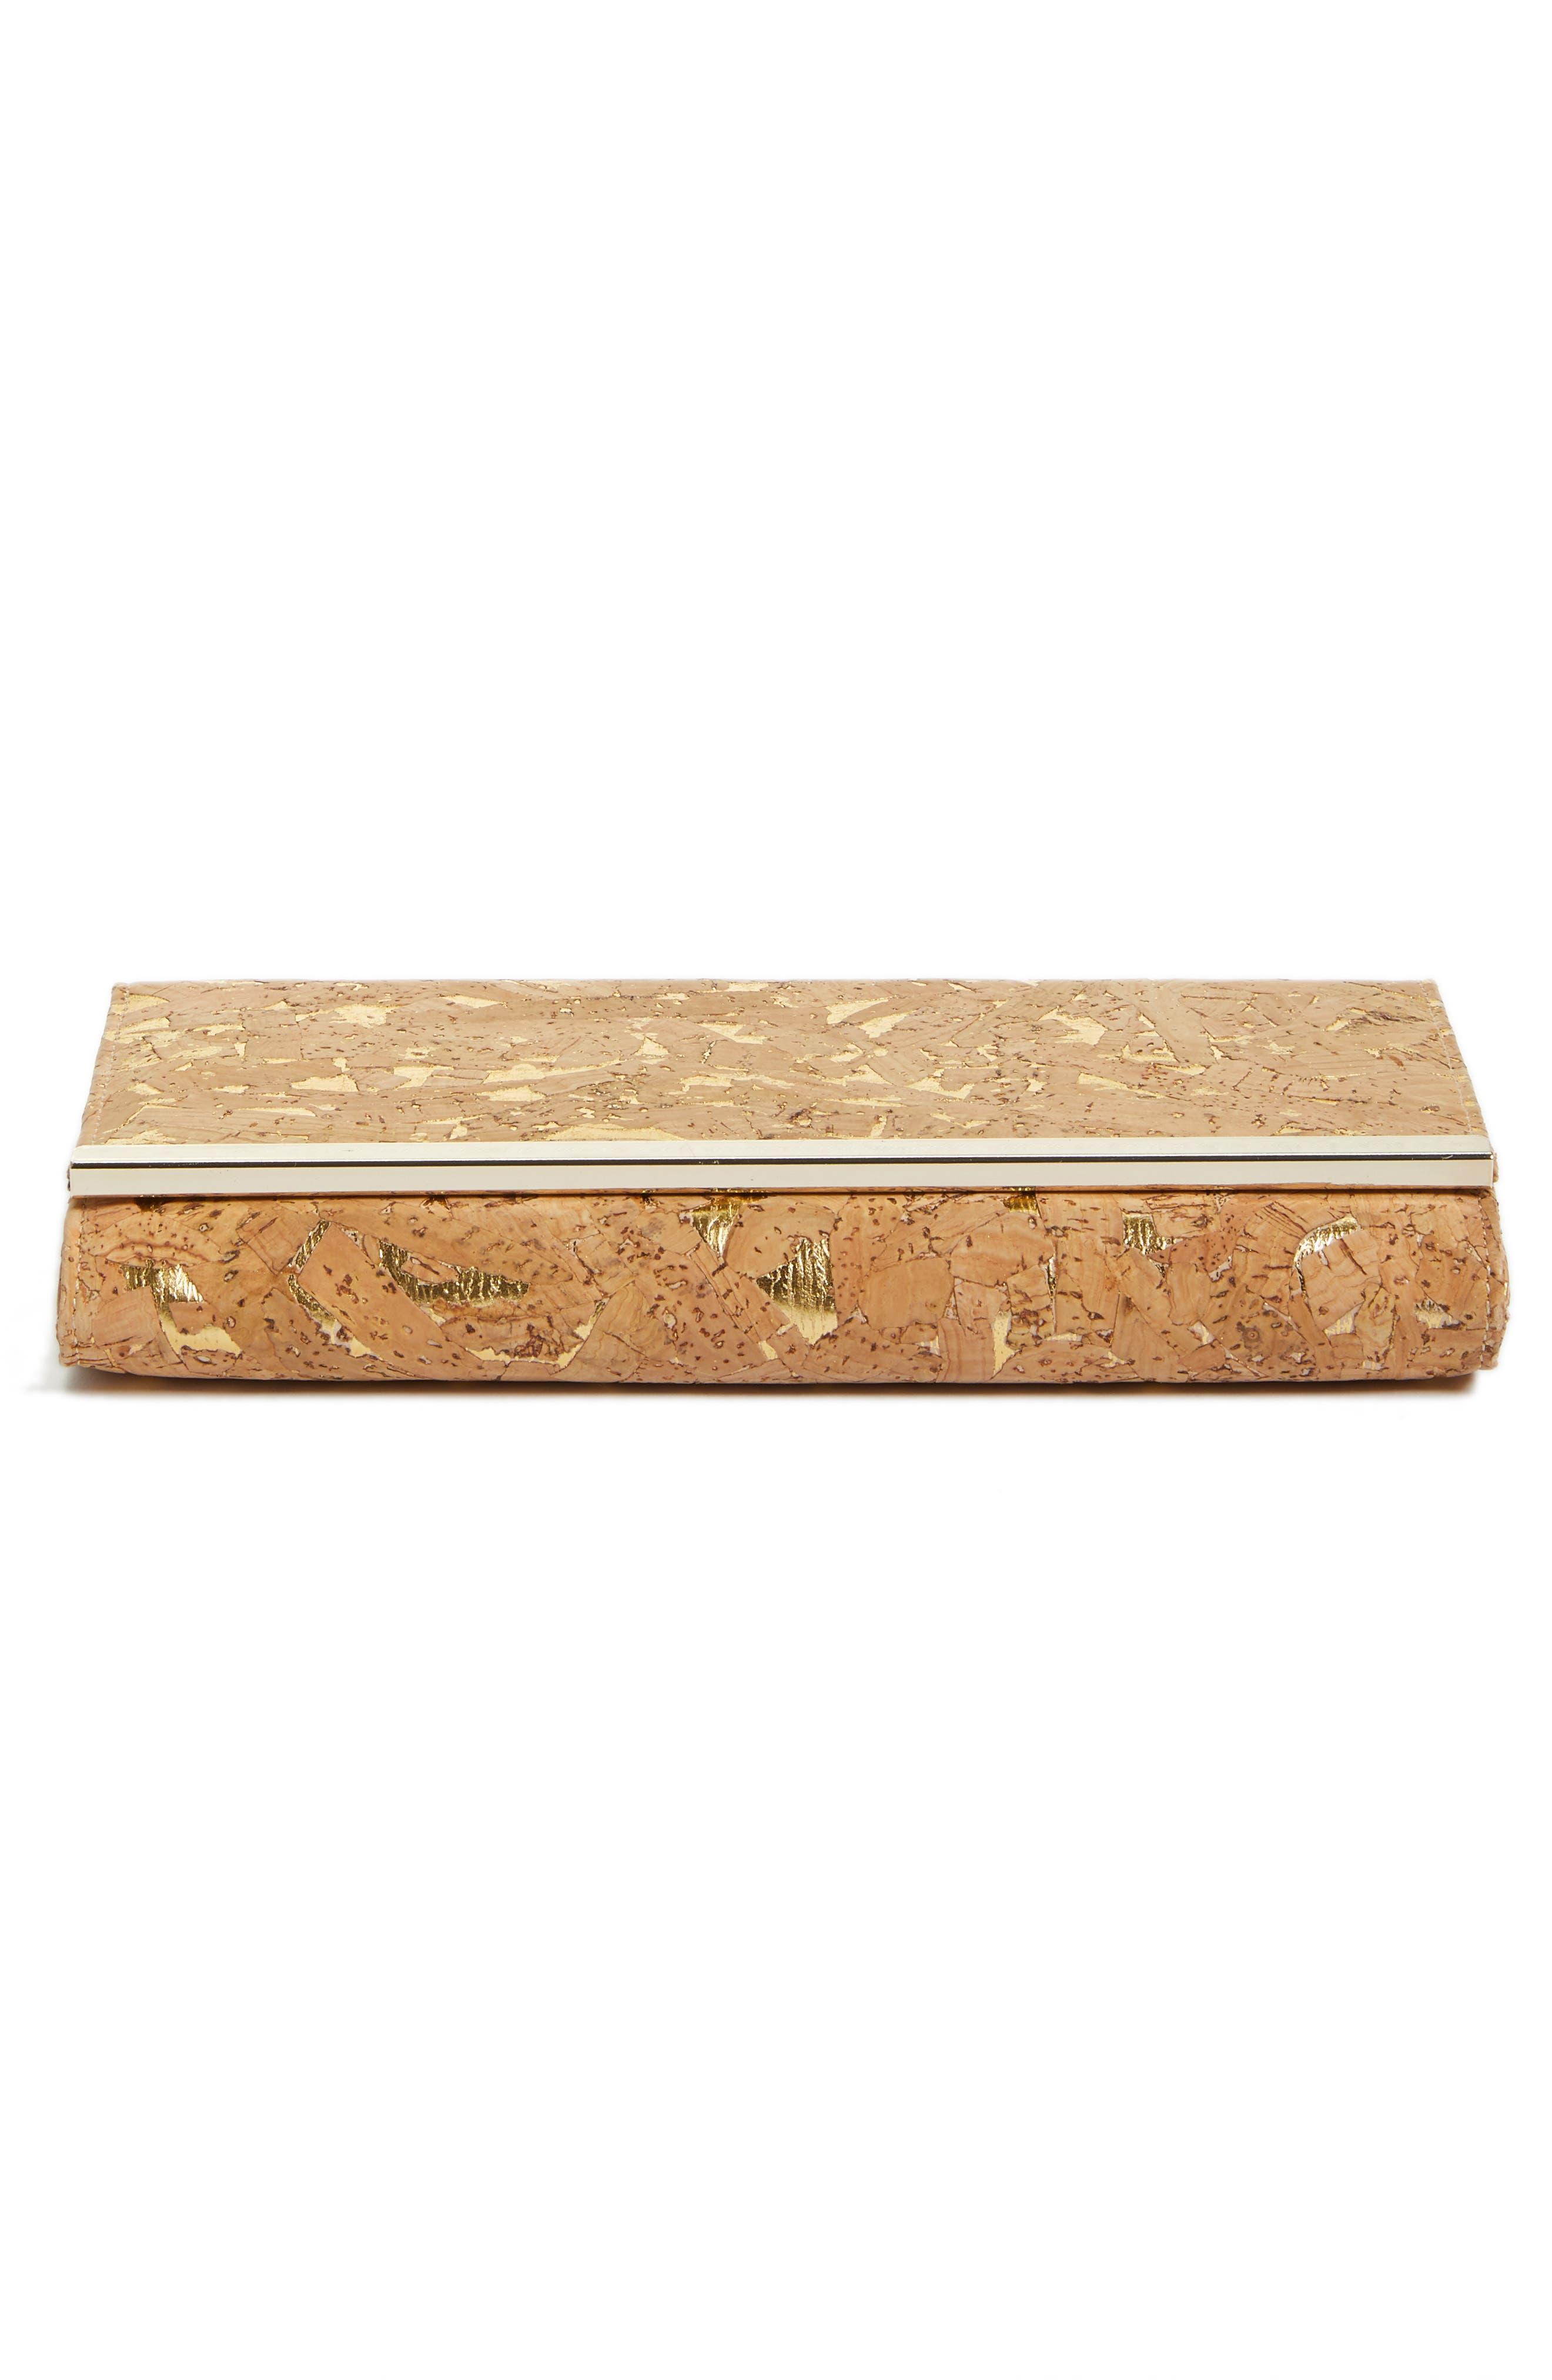 NORDSTROM, Metallic Cork Clutch, Alternate thumbnail 7, color, NATURAL/GOLD